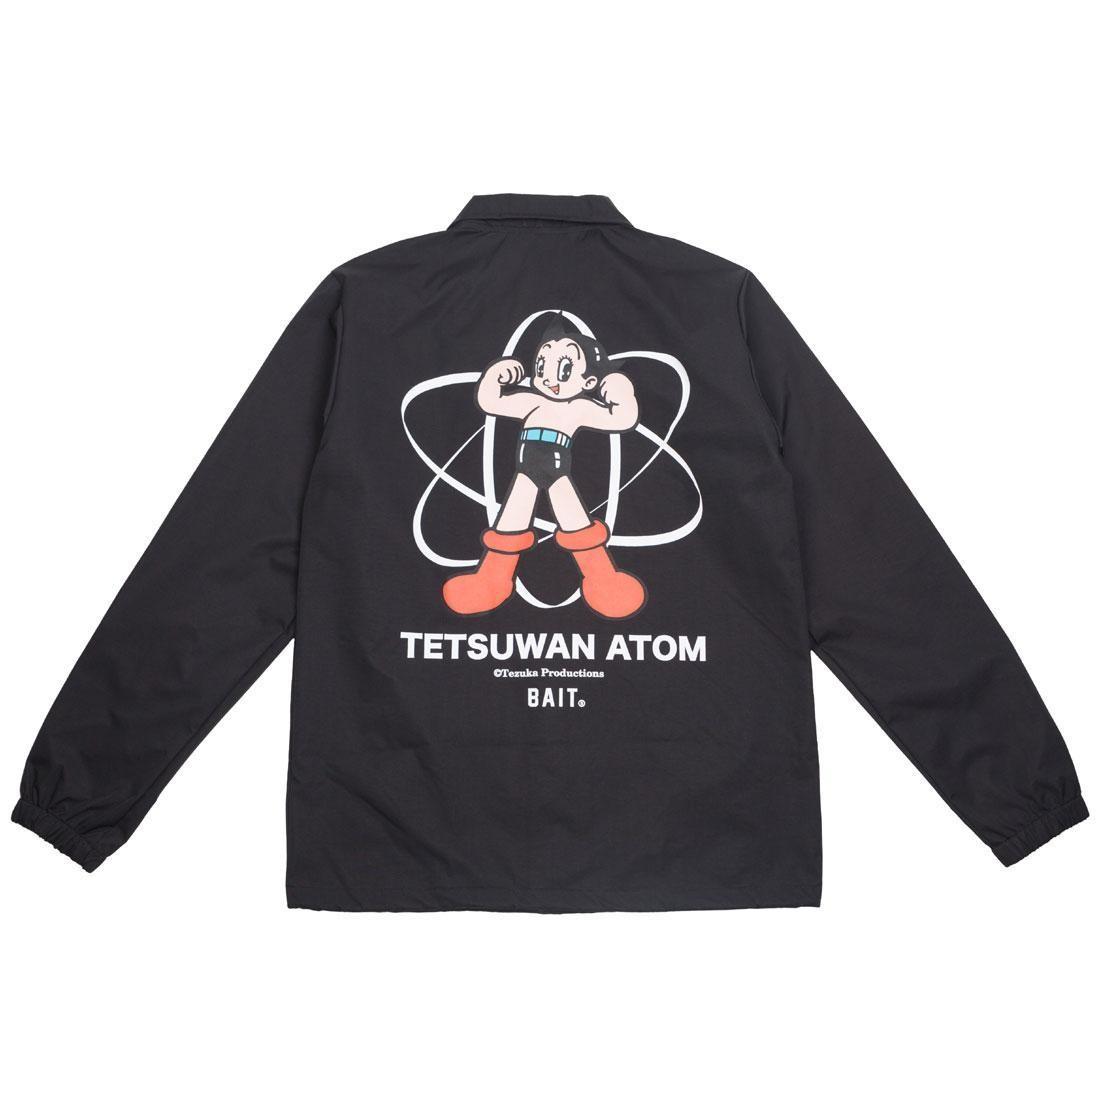 BAIT x Astro Boy Men Tetsuwan Atom Coaches Jacket (black)